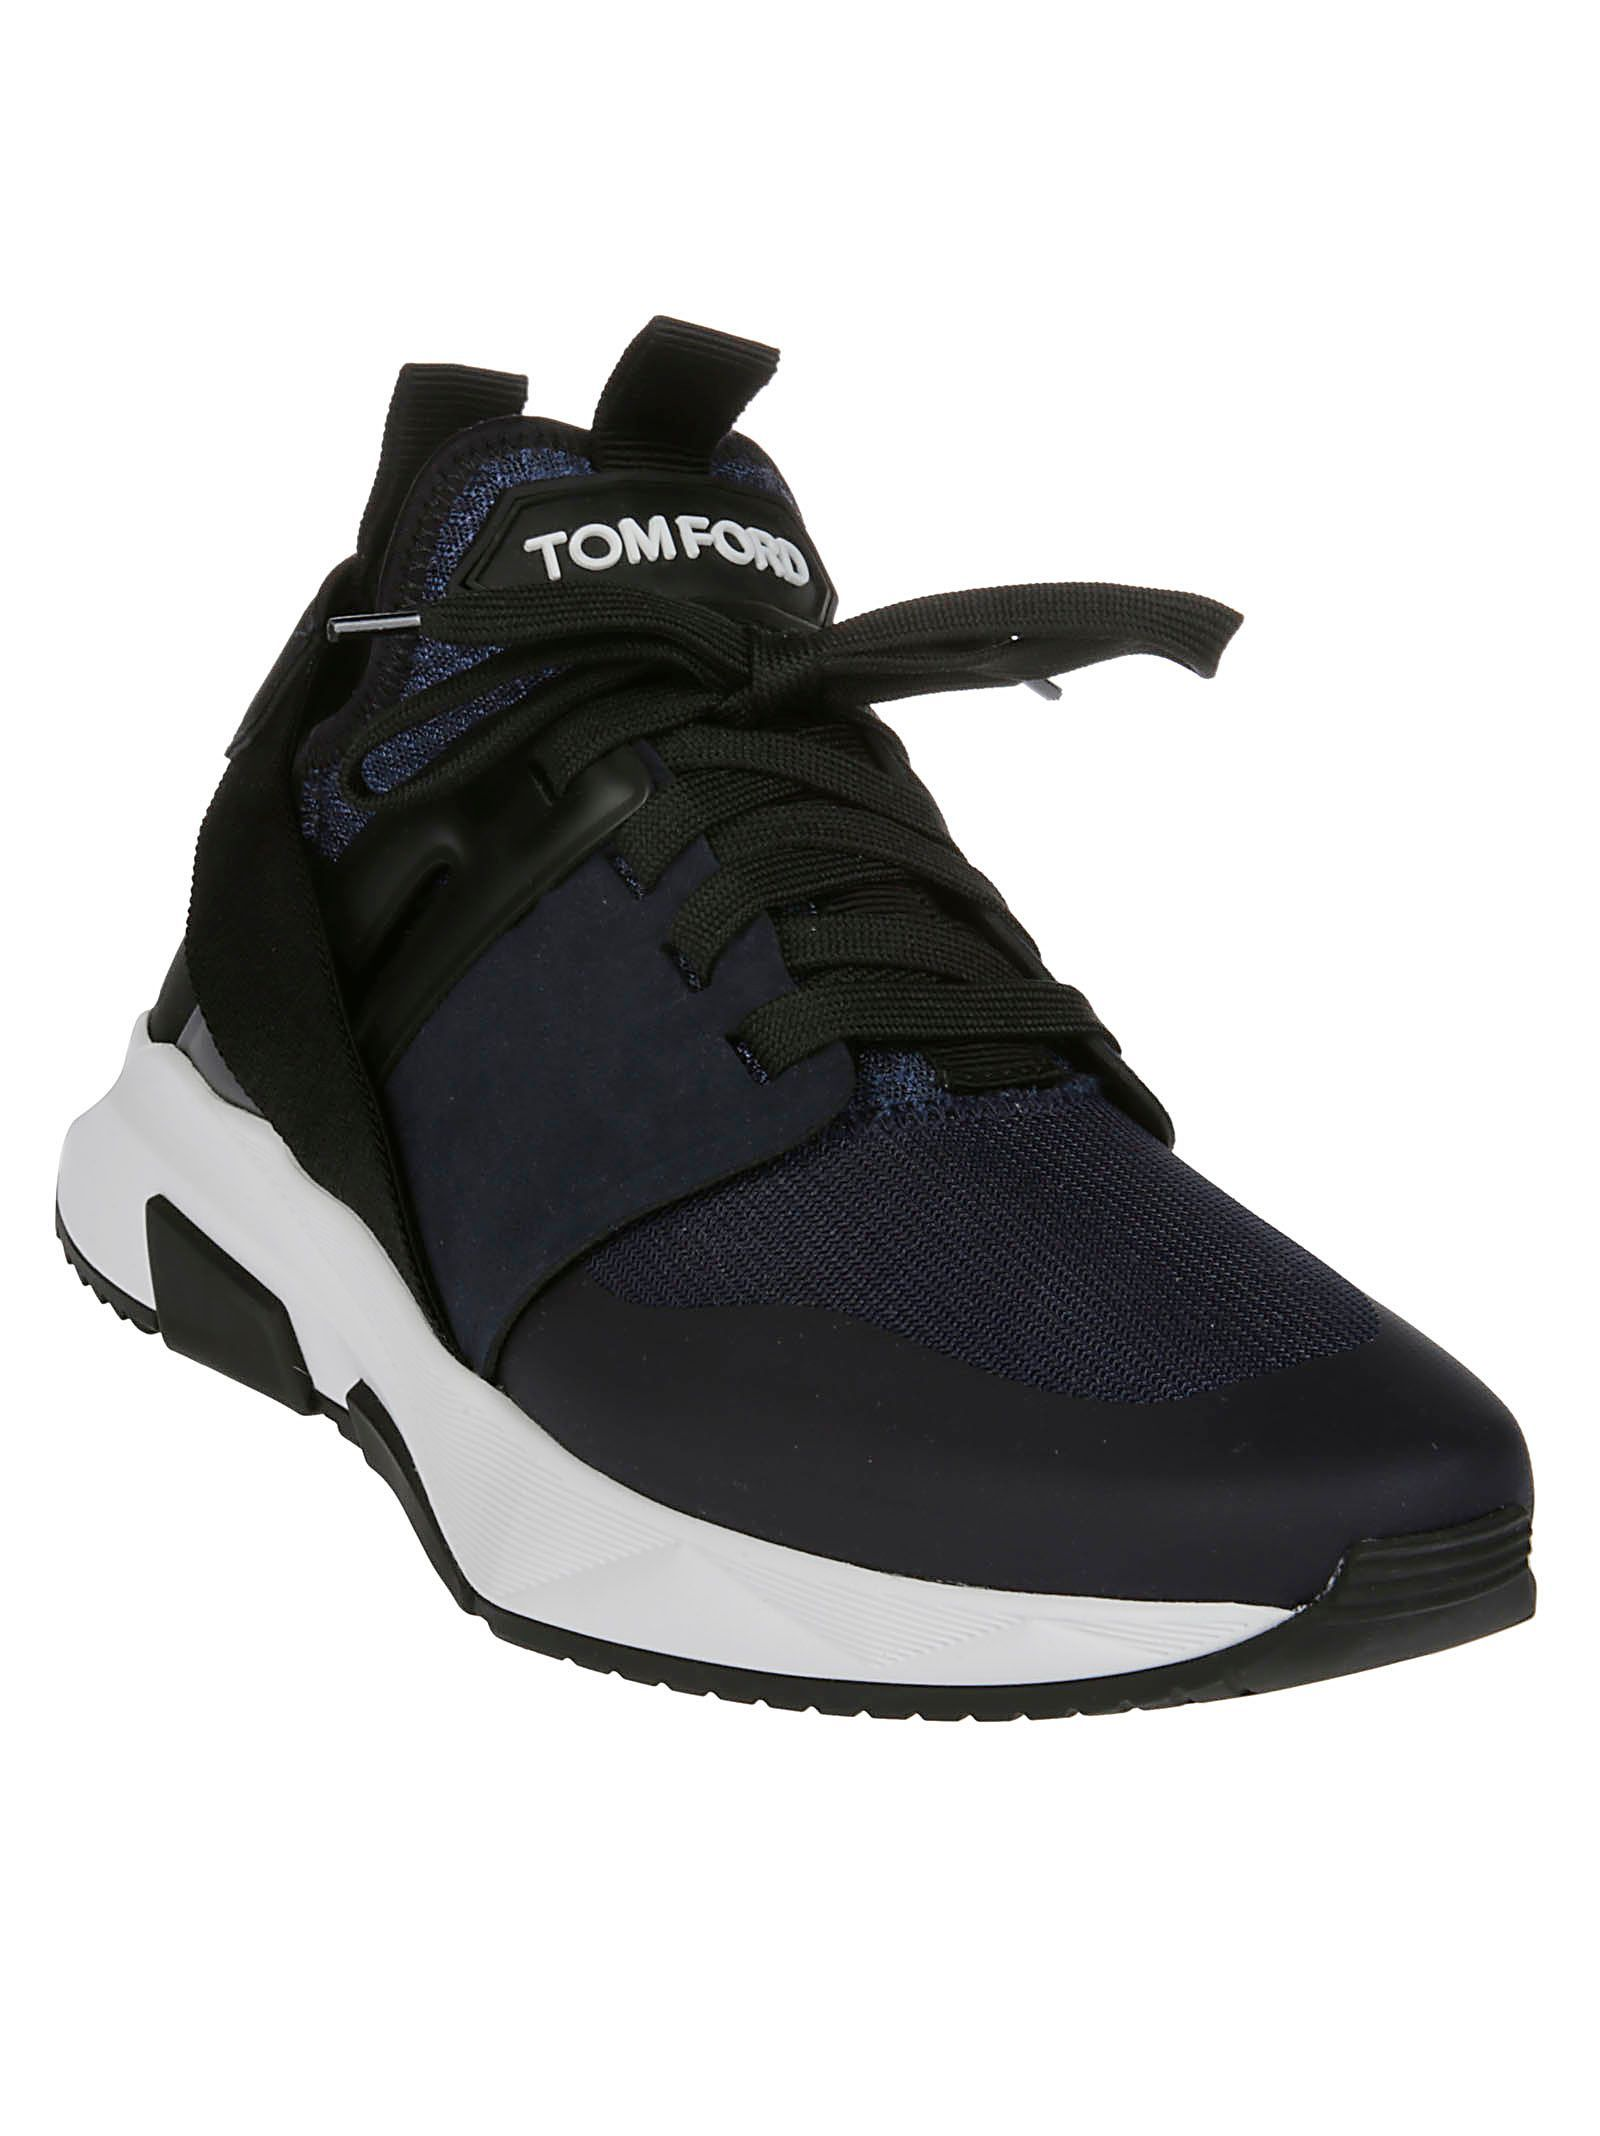 TOM FORD MEN'S J1100TTOF001U5006 BLACK POLYESTER SNEAKERS